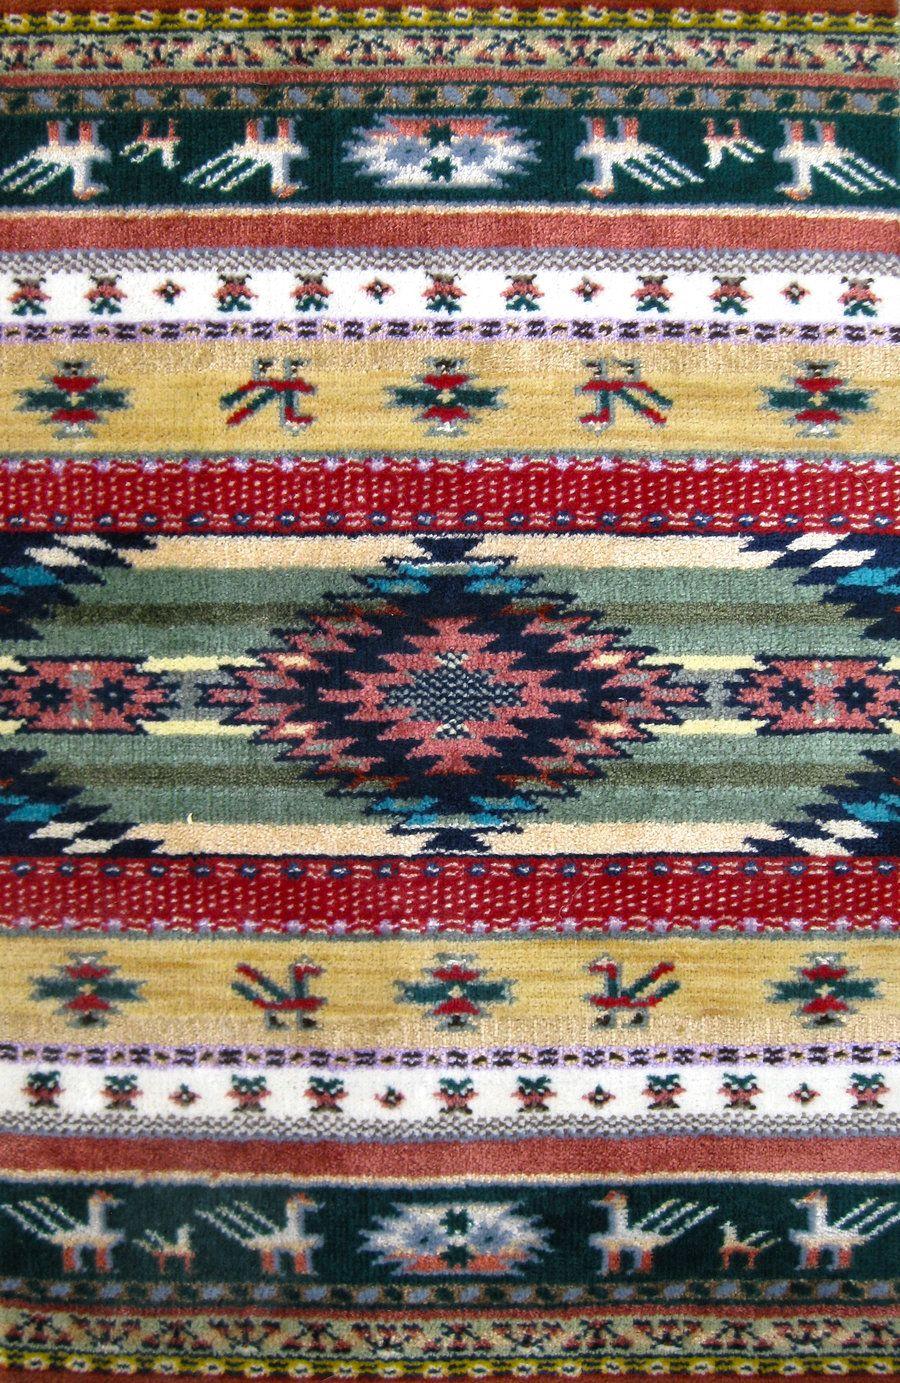 Native American Rug By Cynnalia Stock Deviantart On